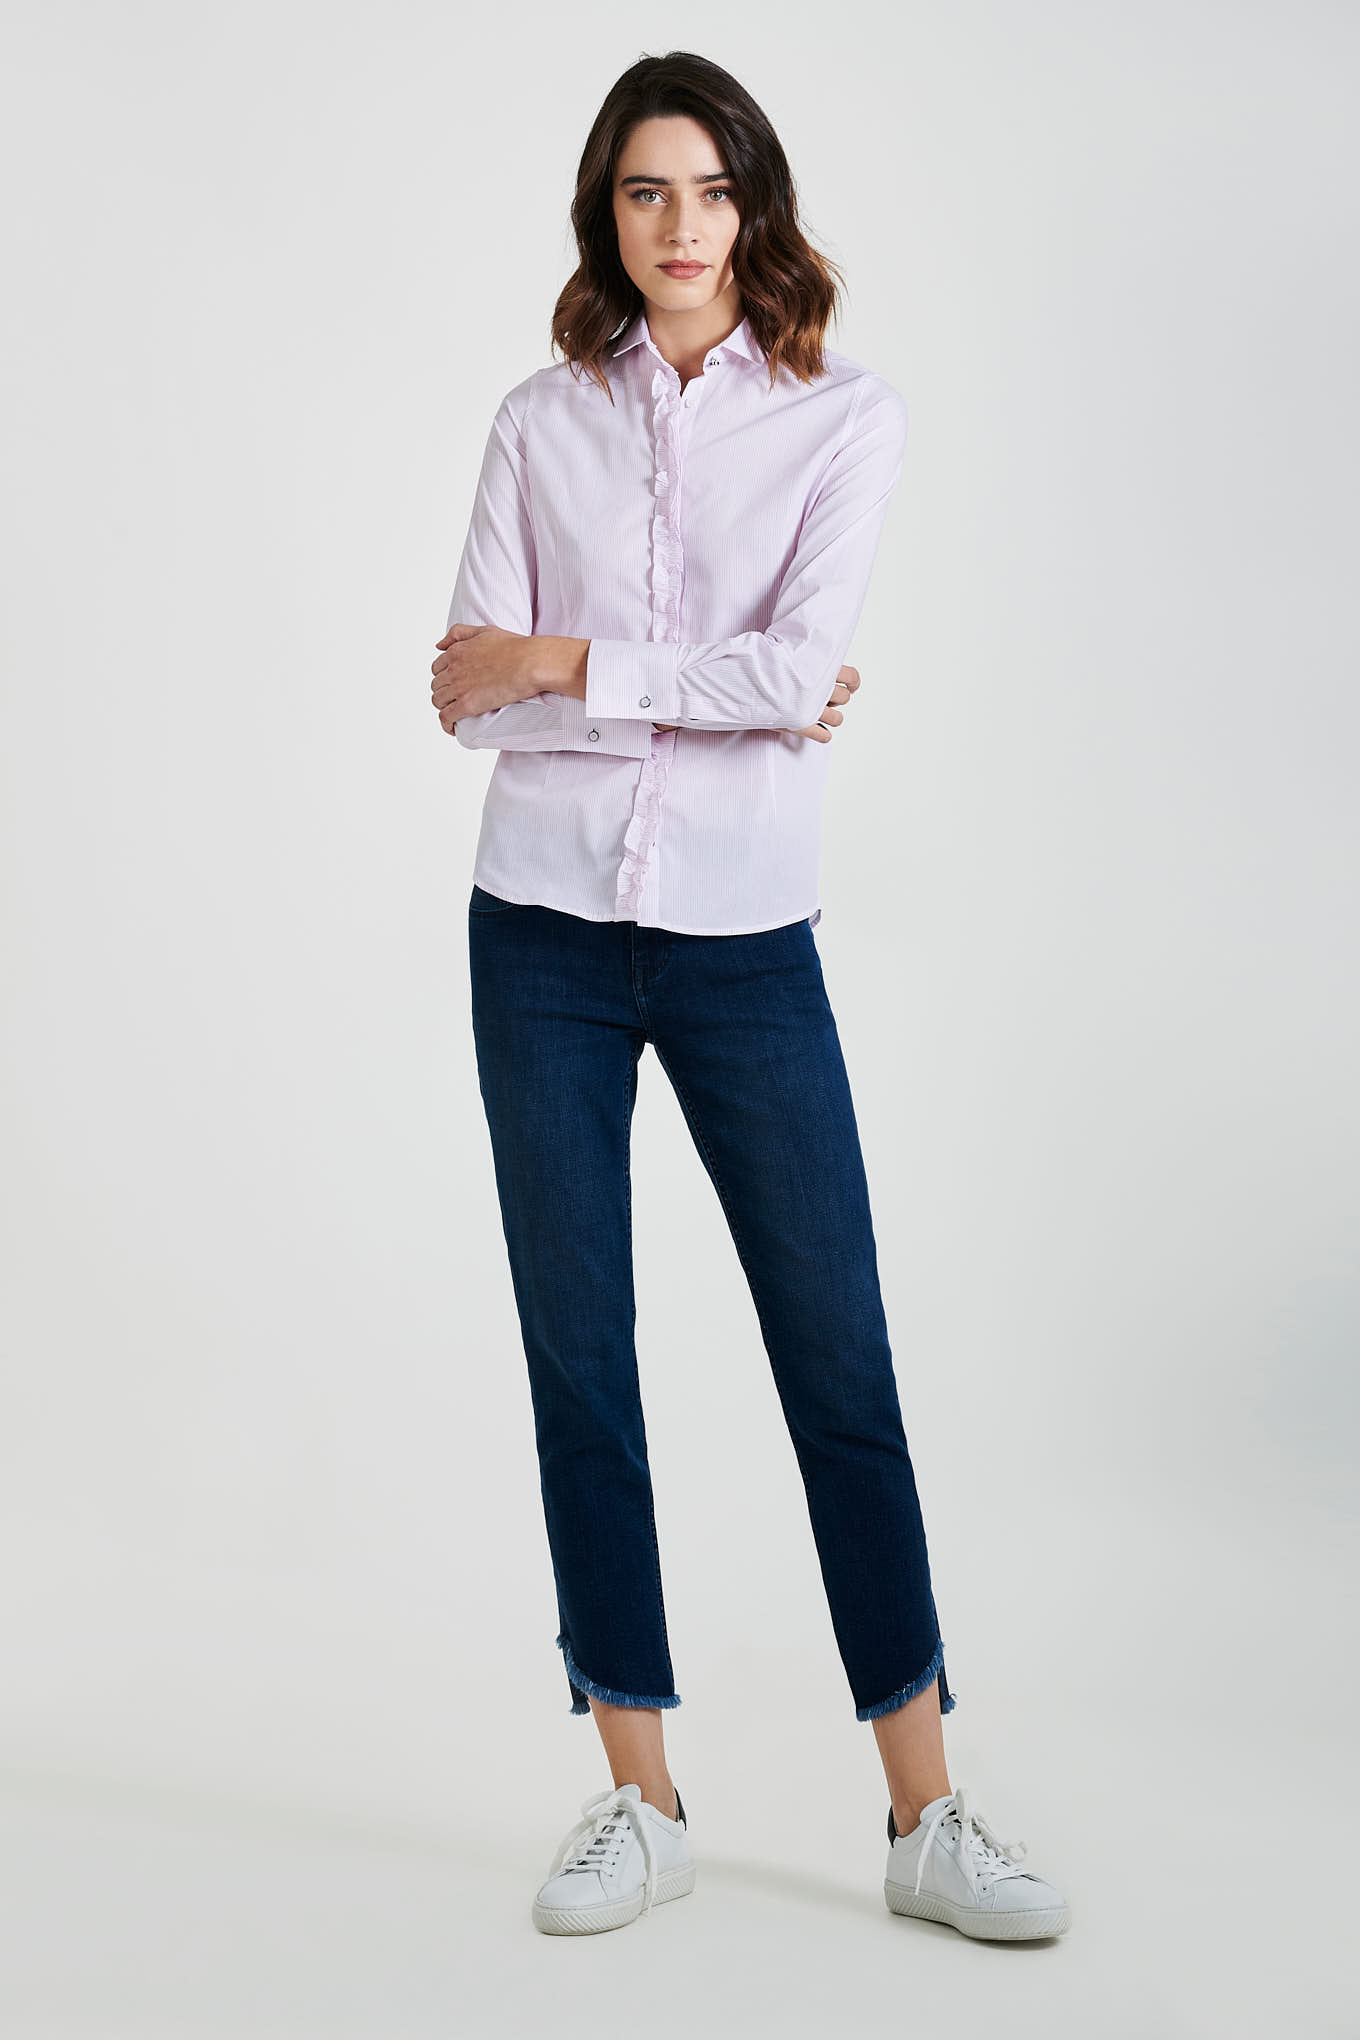 Camisa Rosa Classic Mulher